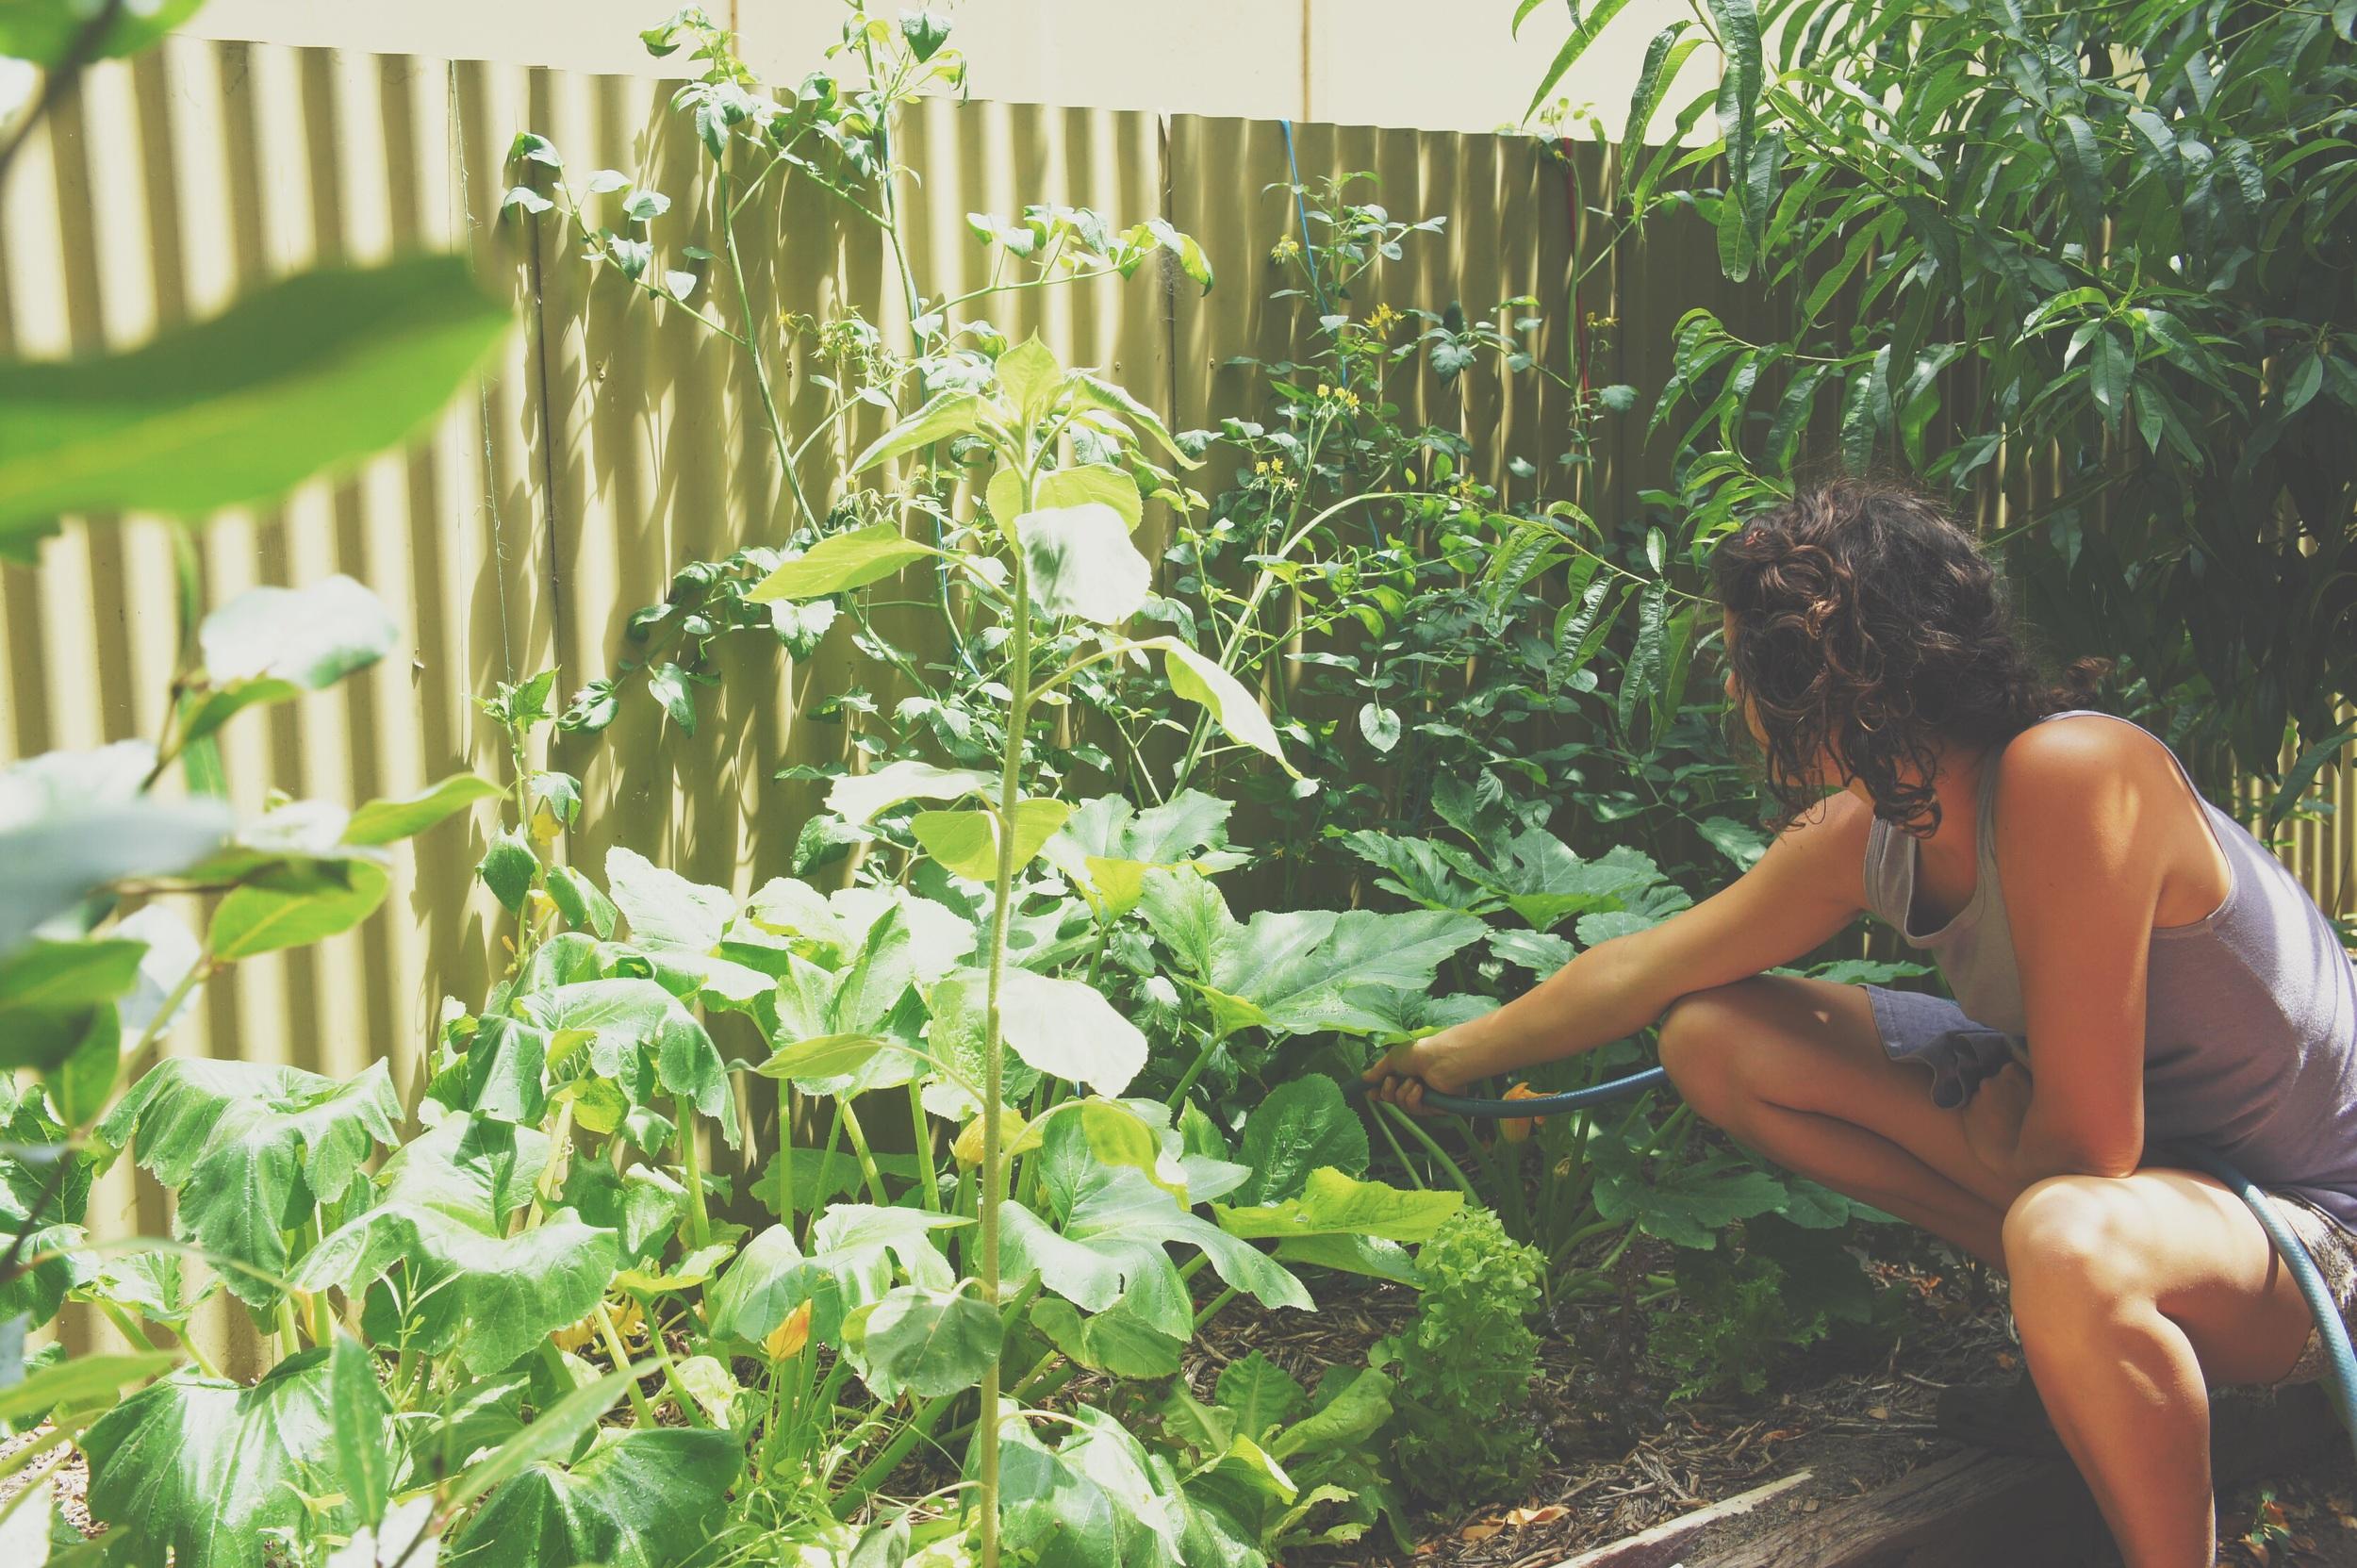 Garden at blue doors on the mains street of Willunga